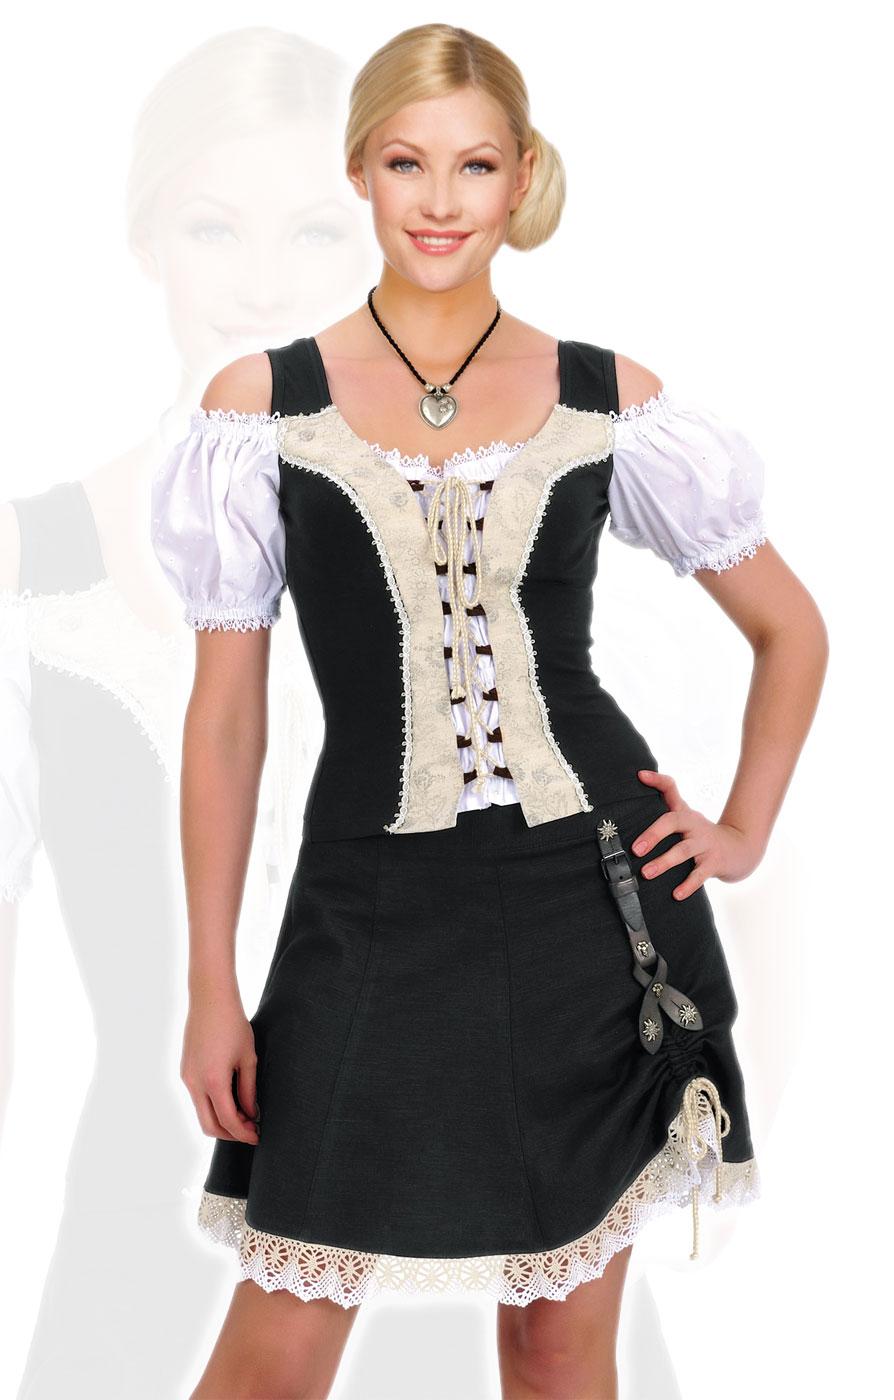 oktoberfest t shirts for bavarian girls oktoberfest. Black Bedroom Furniture Sets. Home Design Ideas